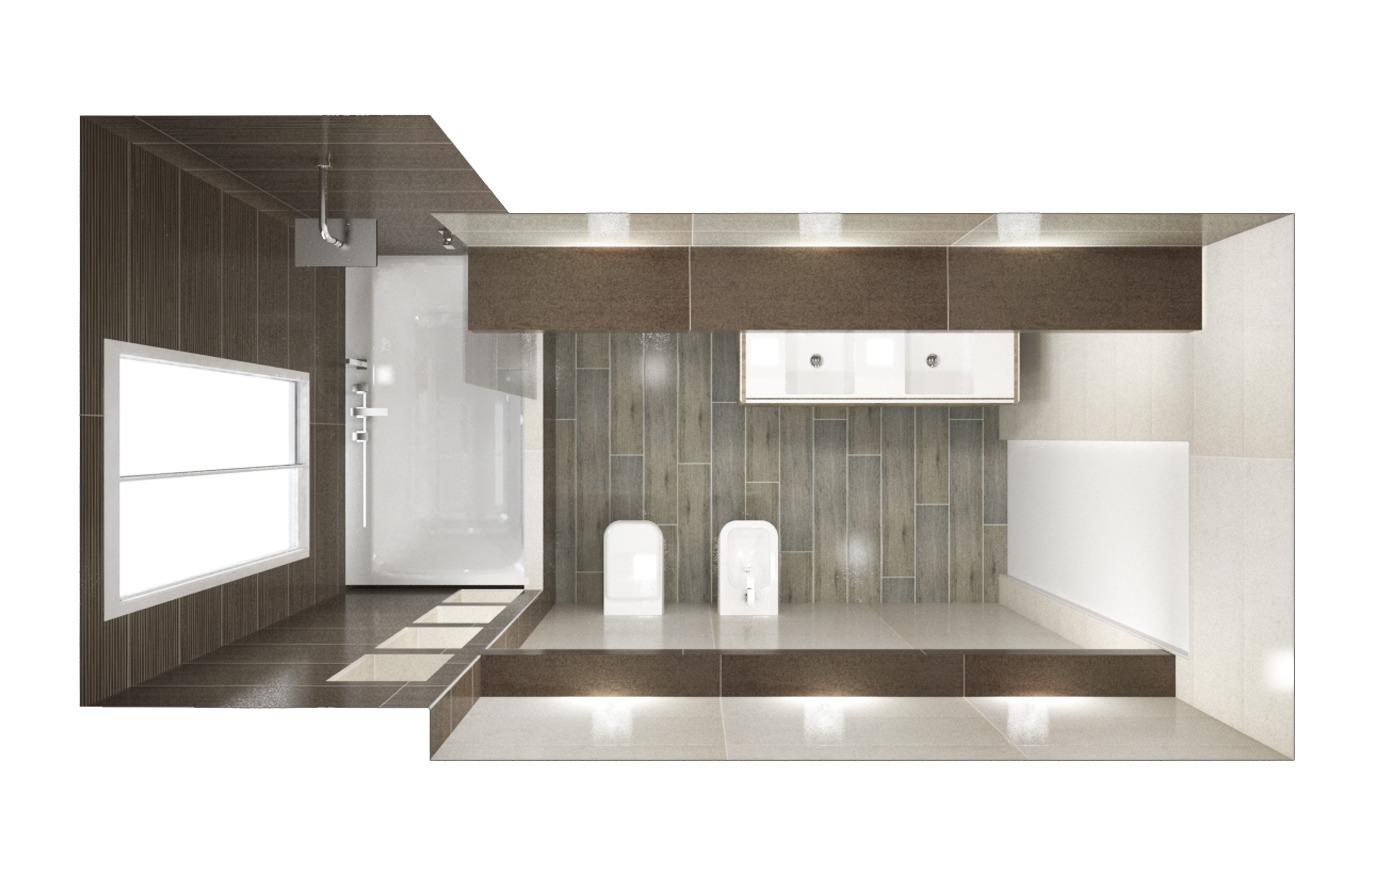 Moderno ed essenziale multiservice mulse for Casa essenziale